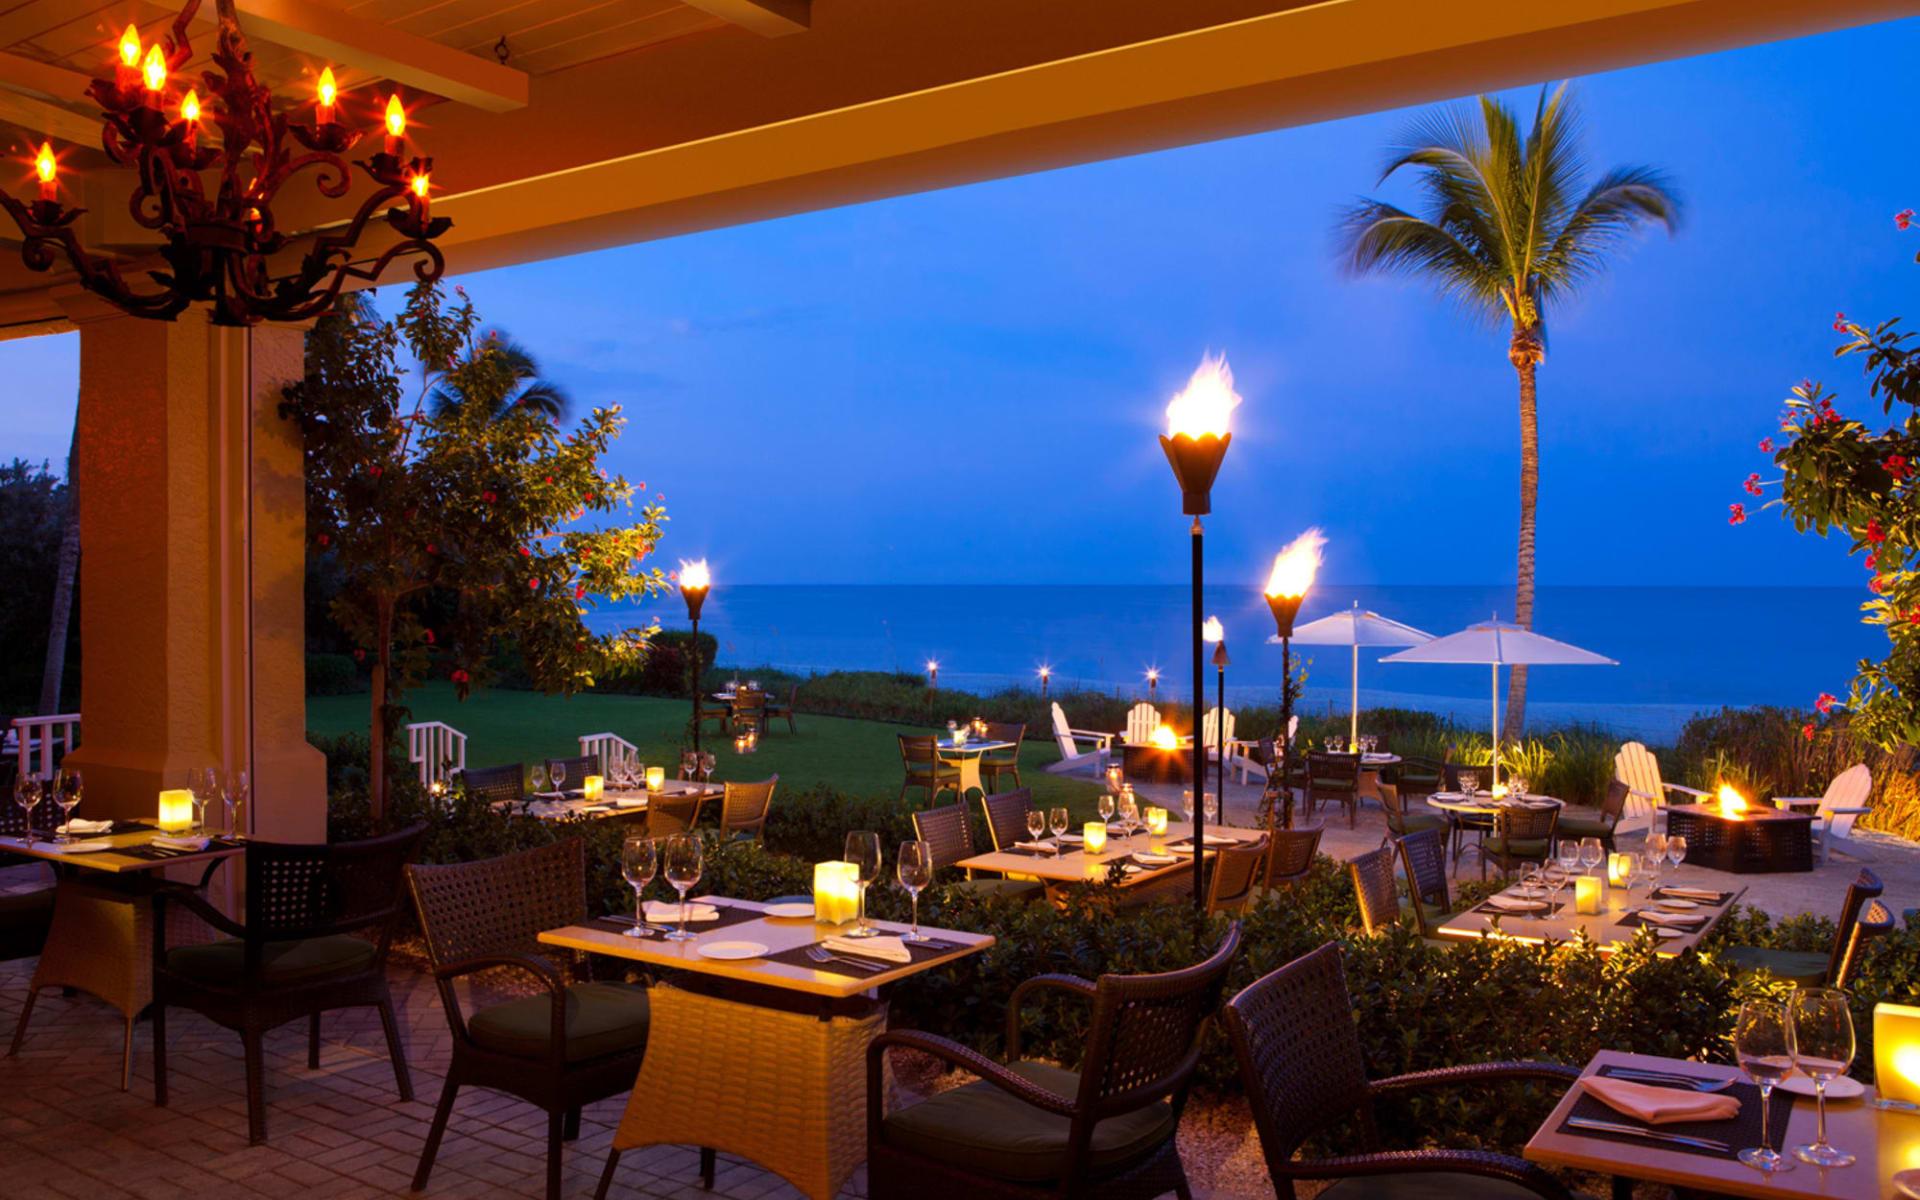 La Playa Beach Resort in Naples:  LaPlaya Beach & Golf Resort - Baleen Restaurant